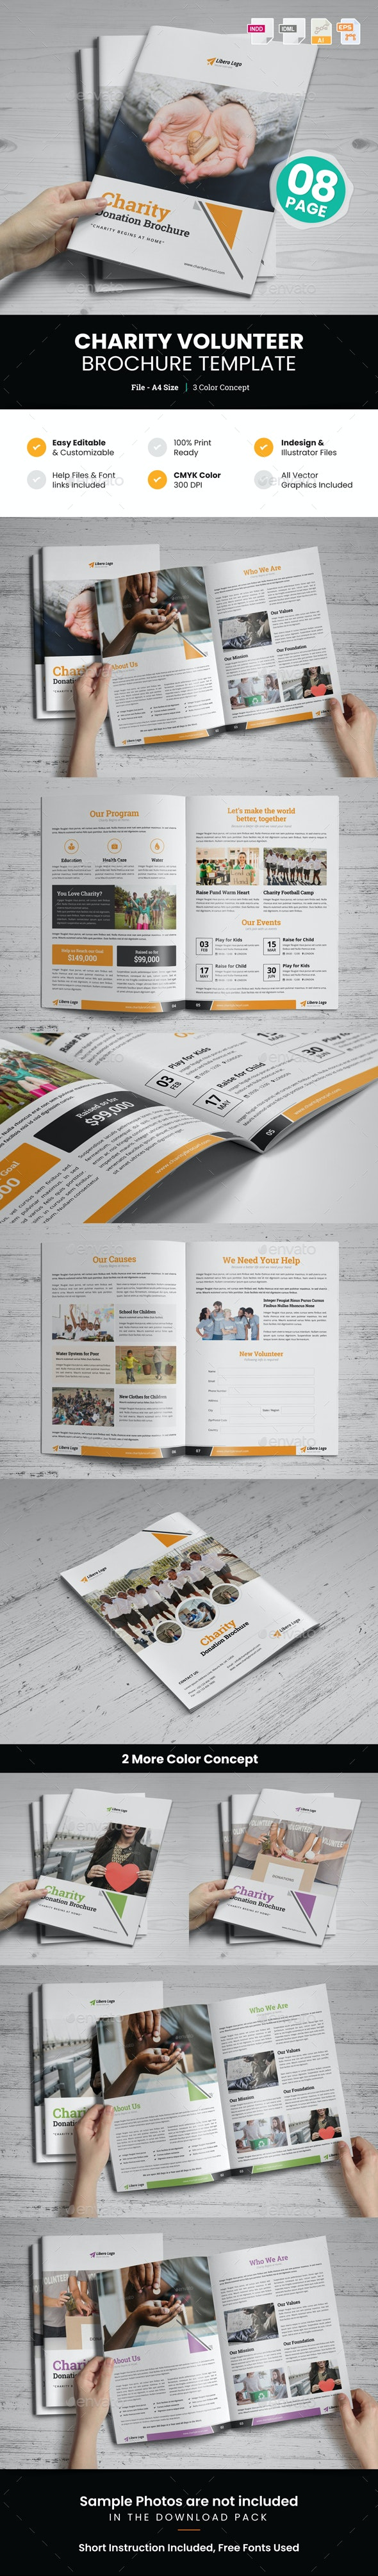 Charity Volunteer Donation Brochure v1 - Corporate Brochures